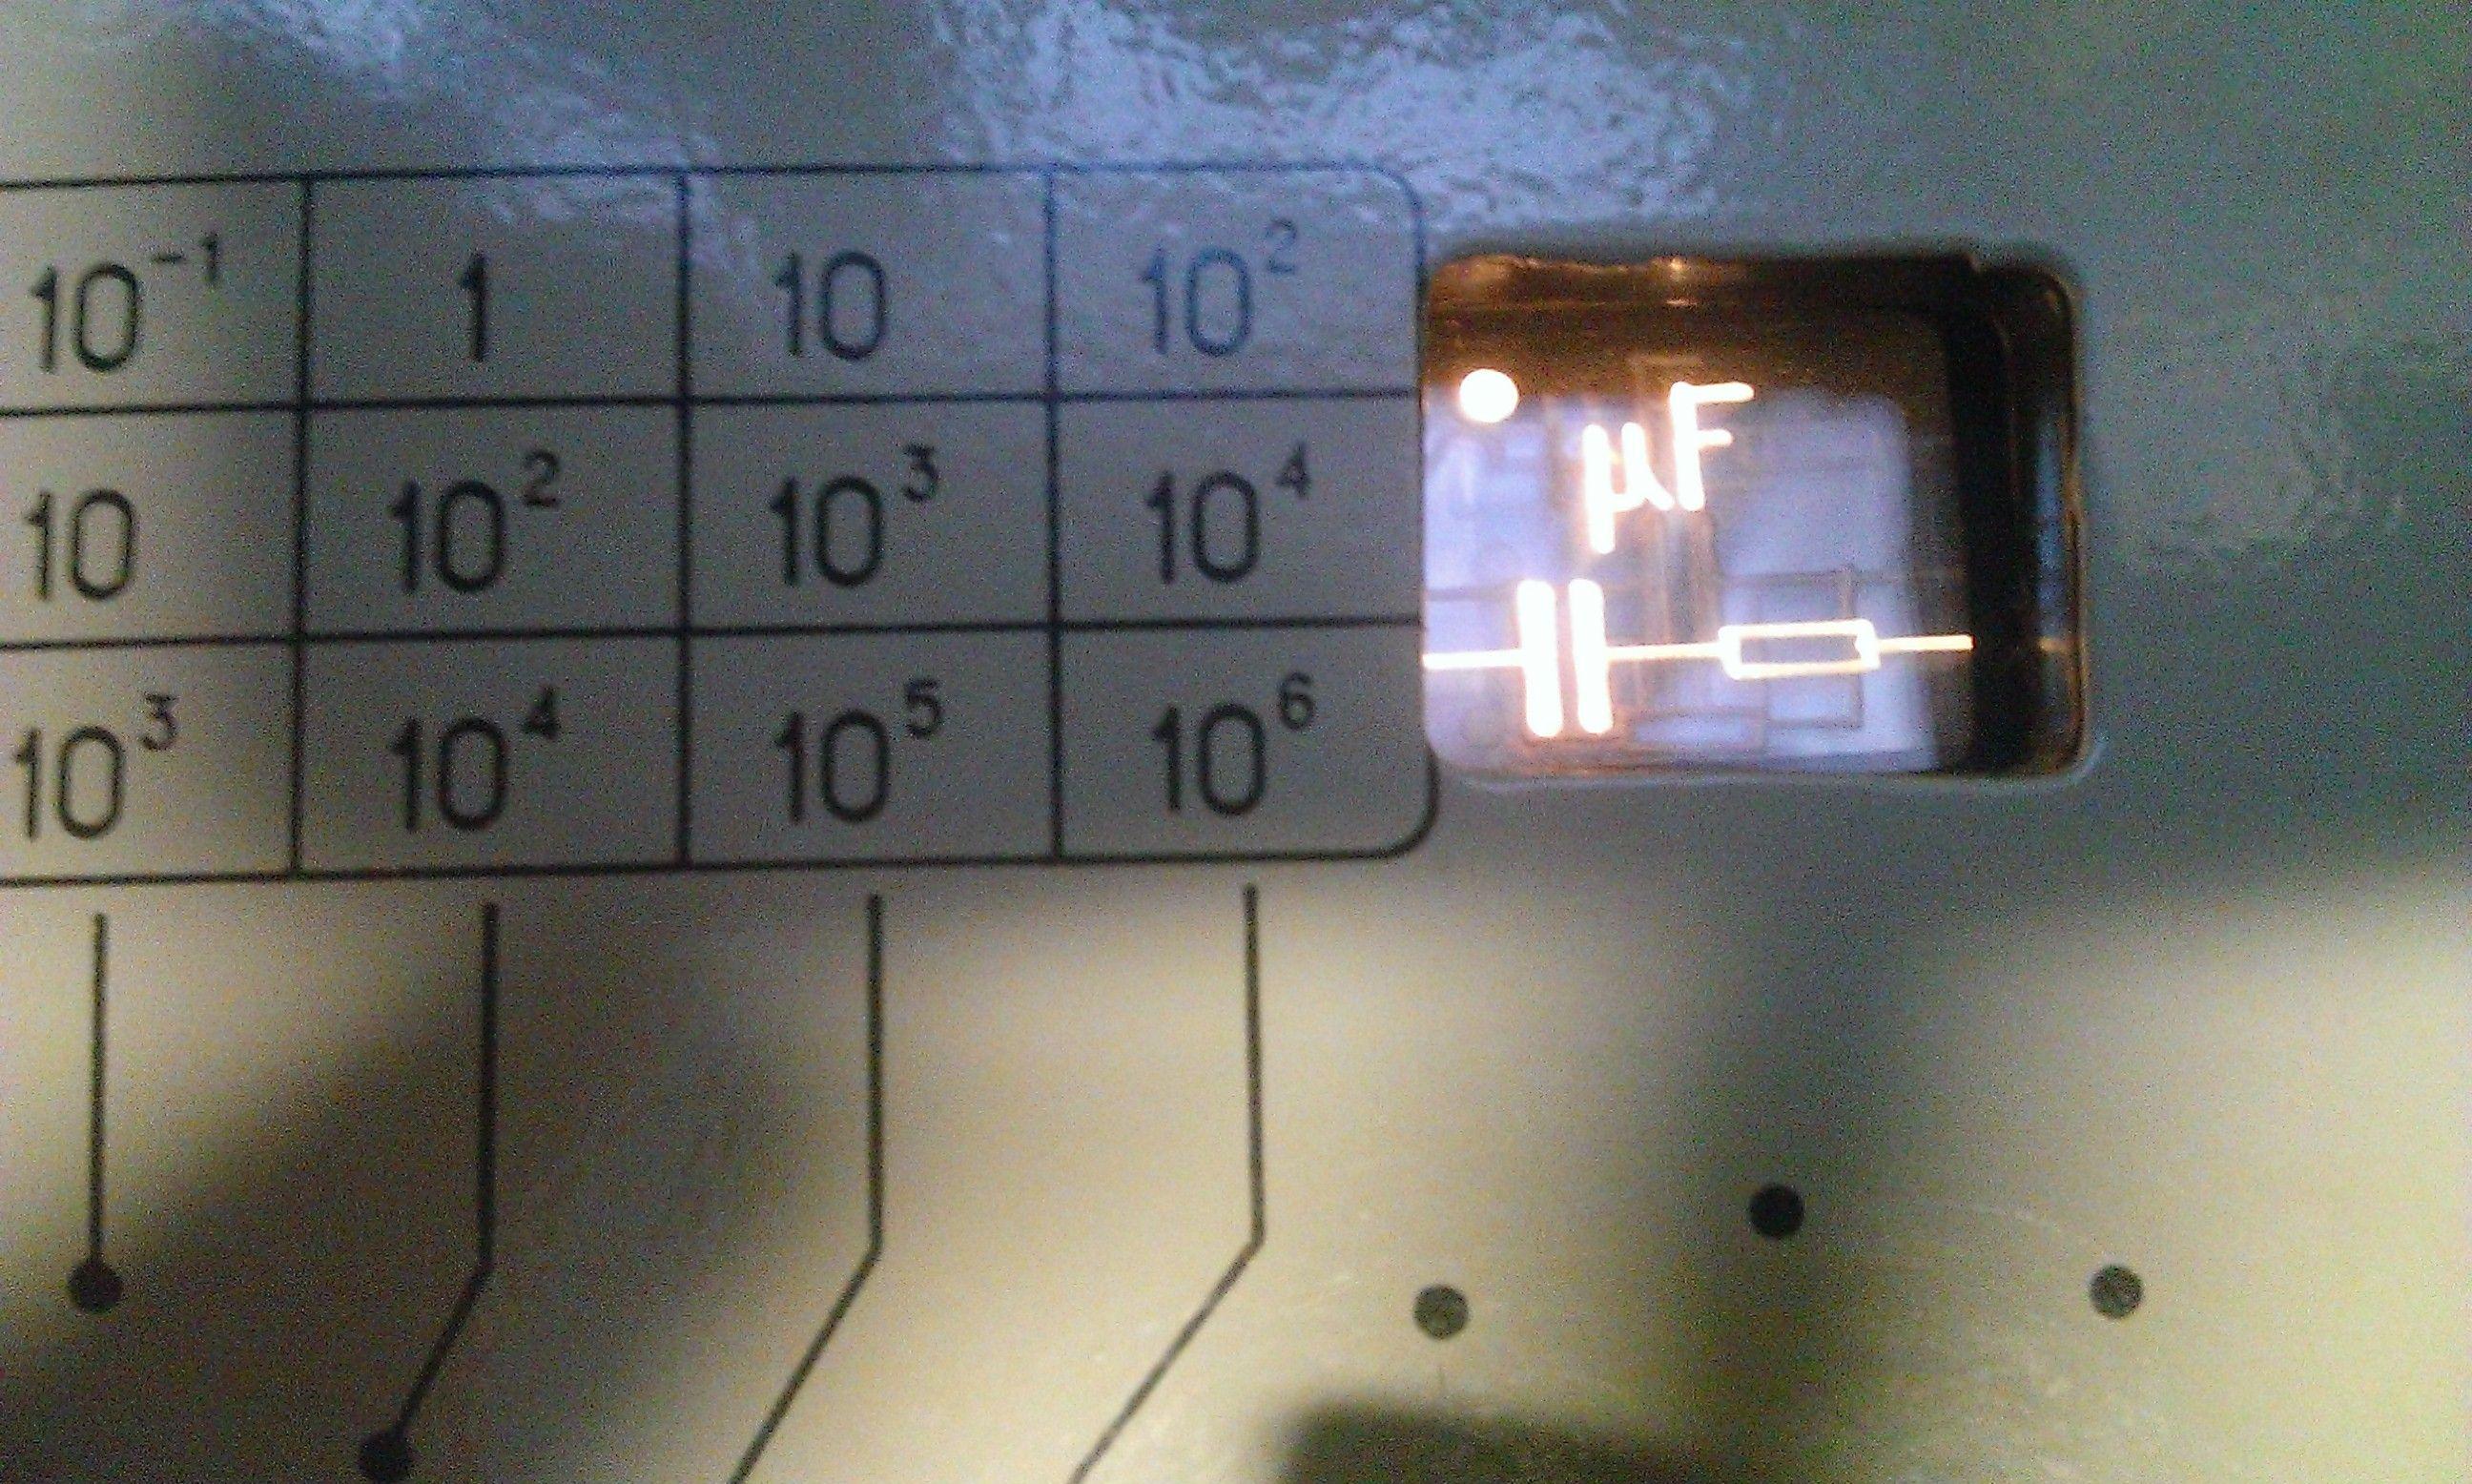 Р577 - индикация режима измерения